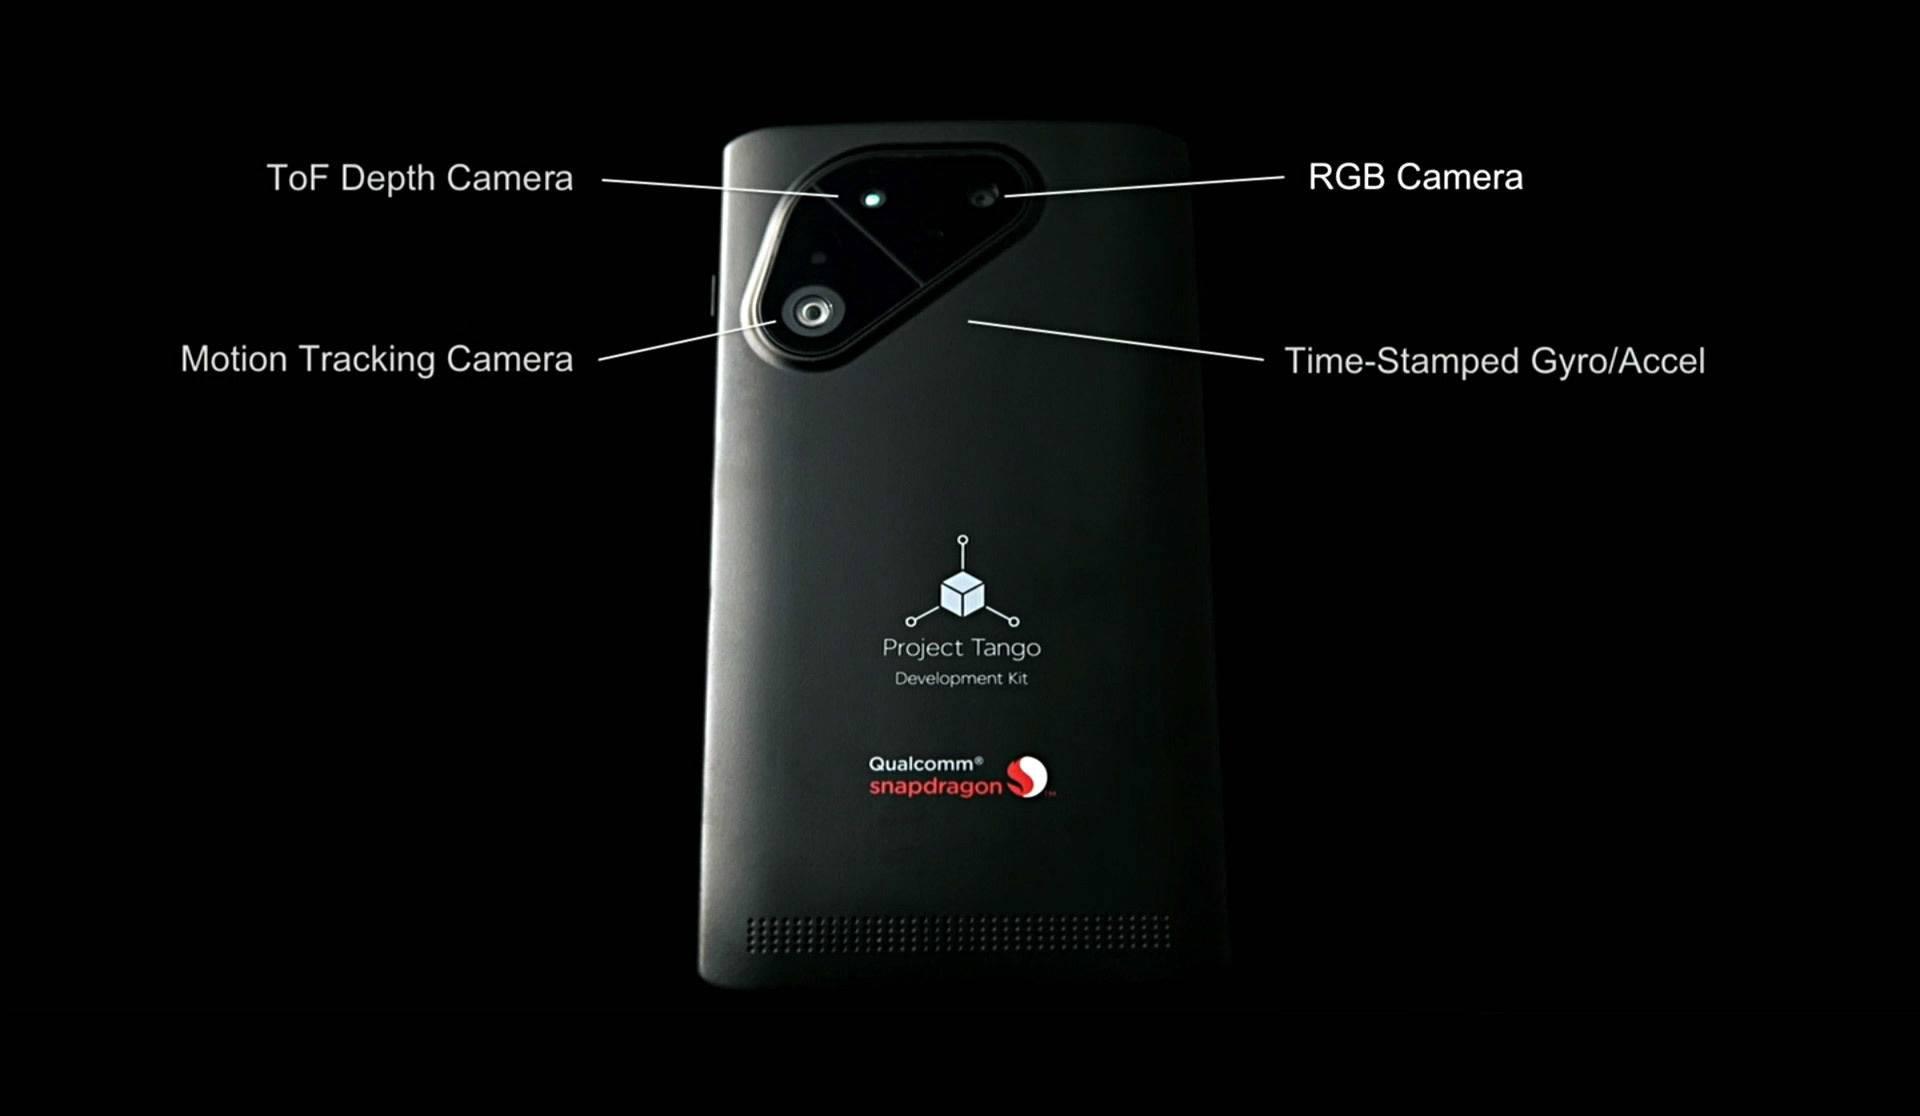 google-project-tango-qualcomm-snapdragon-reference-design-smartphone.jpg